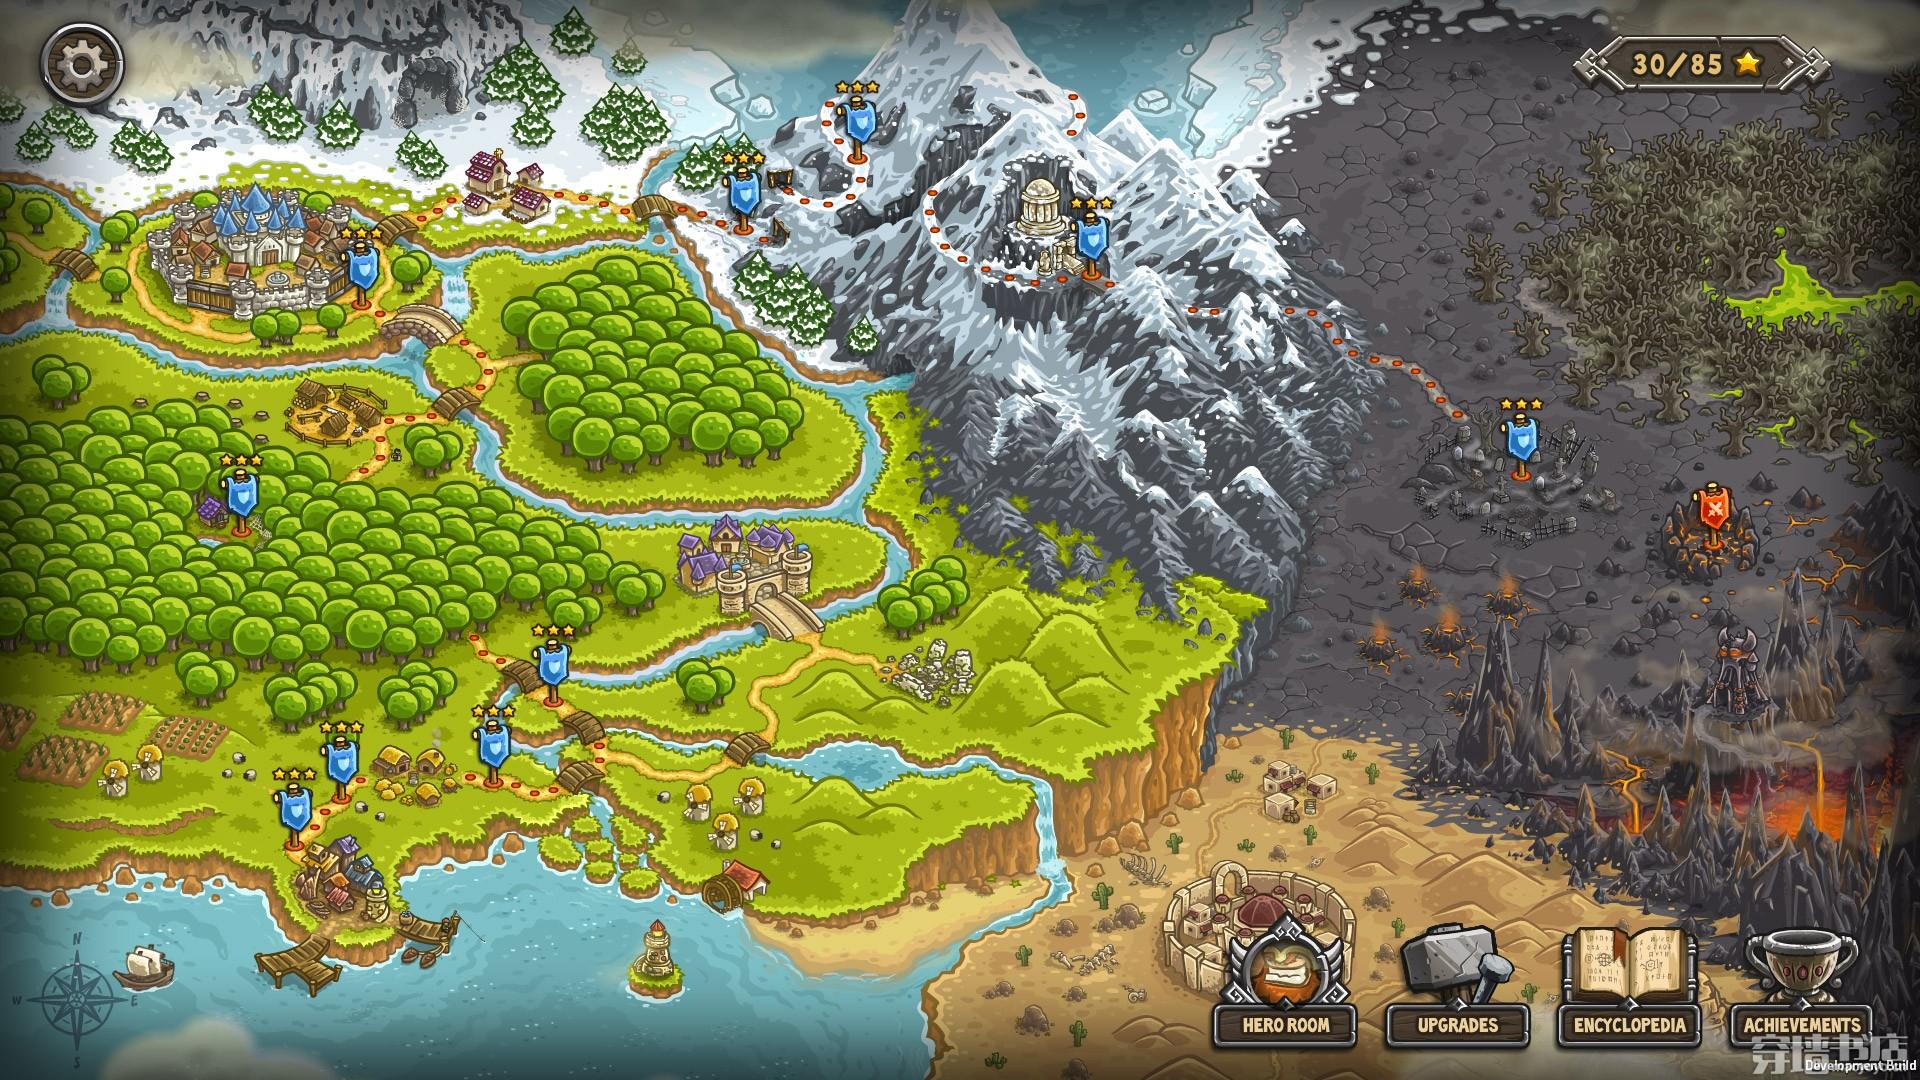 Kingdom Rush《皇家守卫军》免安装绿色版 v2.2版 非常火爆好玩的PC游戏